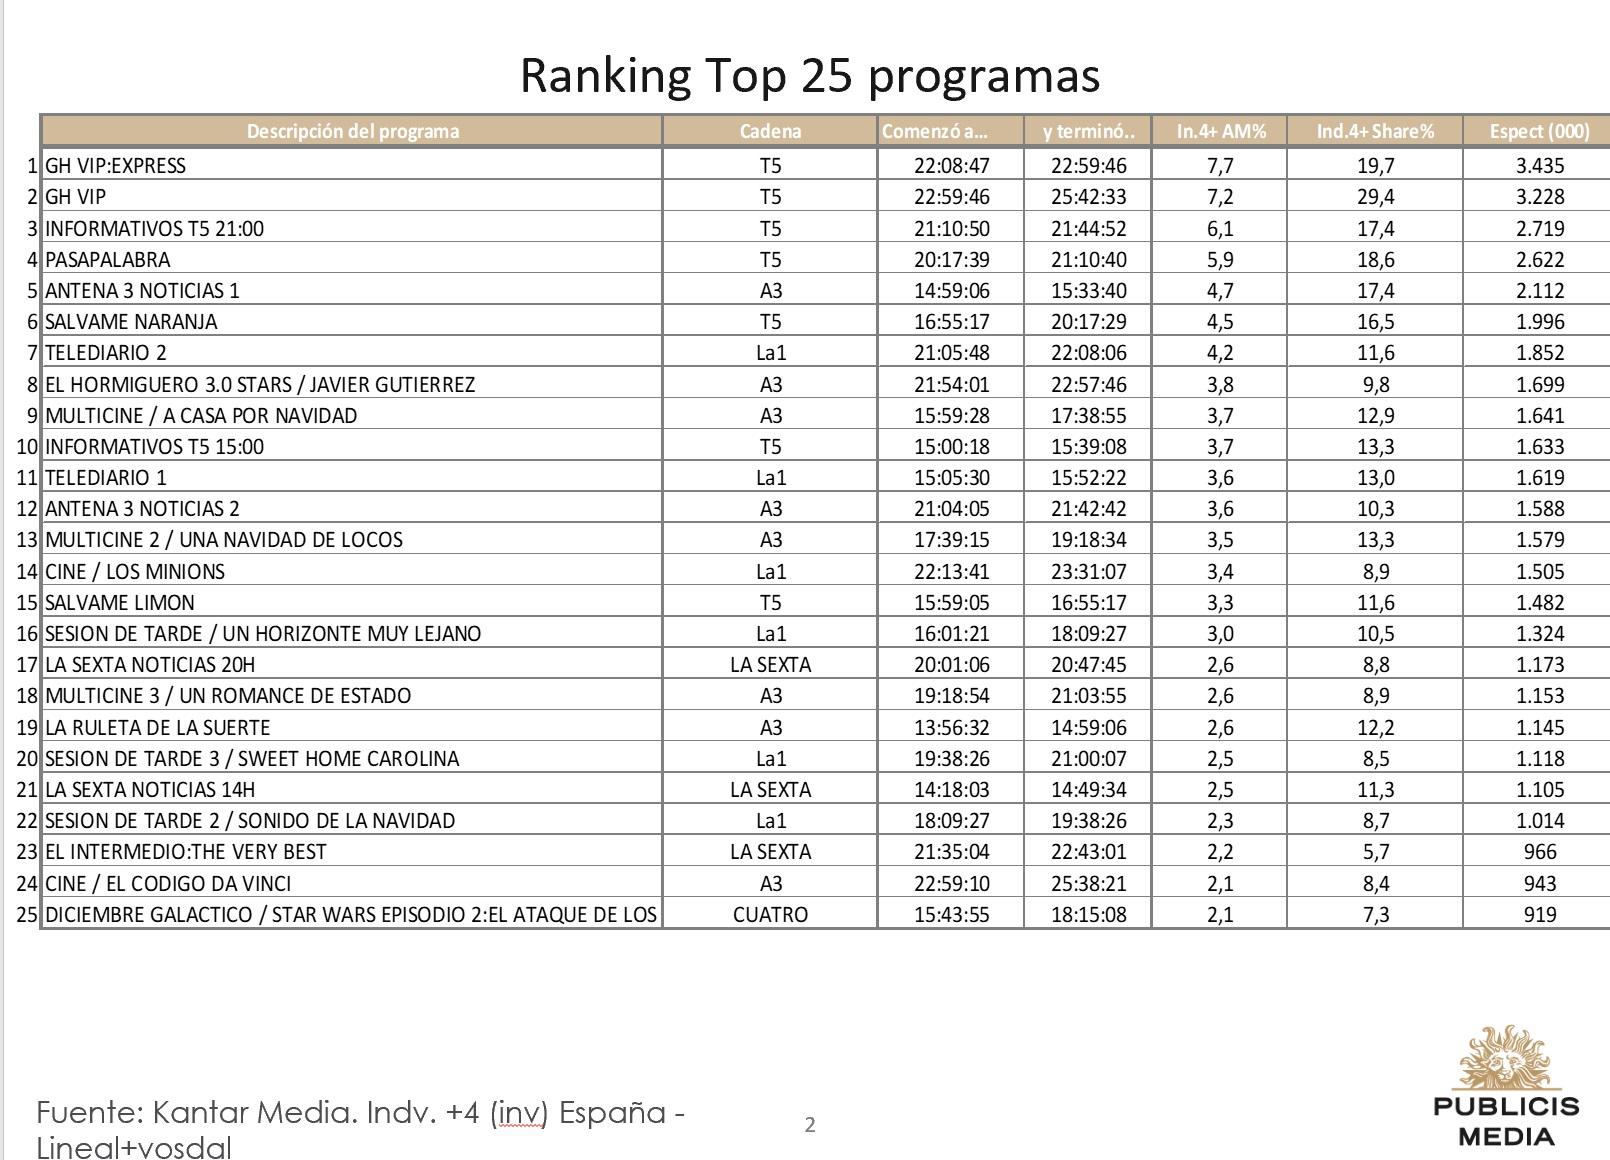 http://www.programapublicidad.com/wp-content/uploads/2018/12/Top-25-Publicis-media-6-dic-2018-programapublicidad-muy-grande.jpg